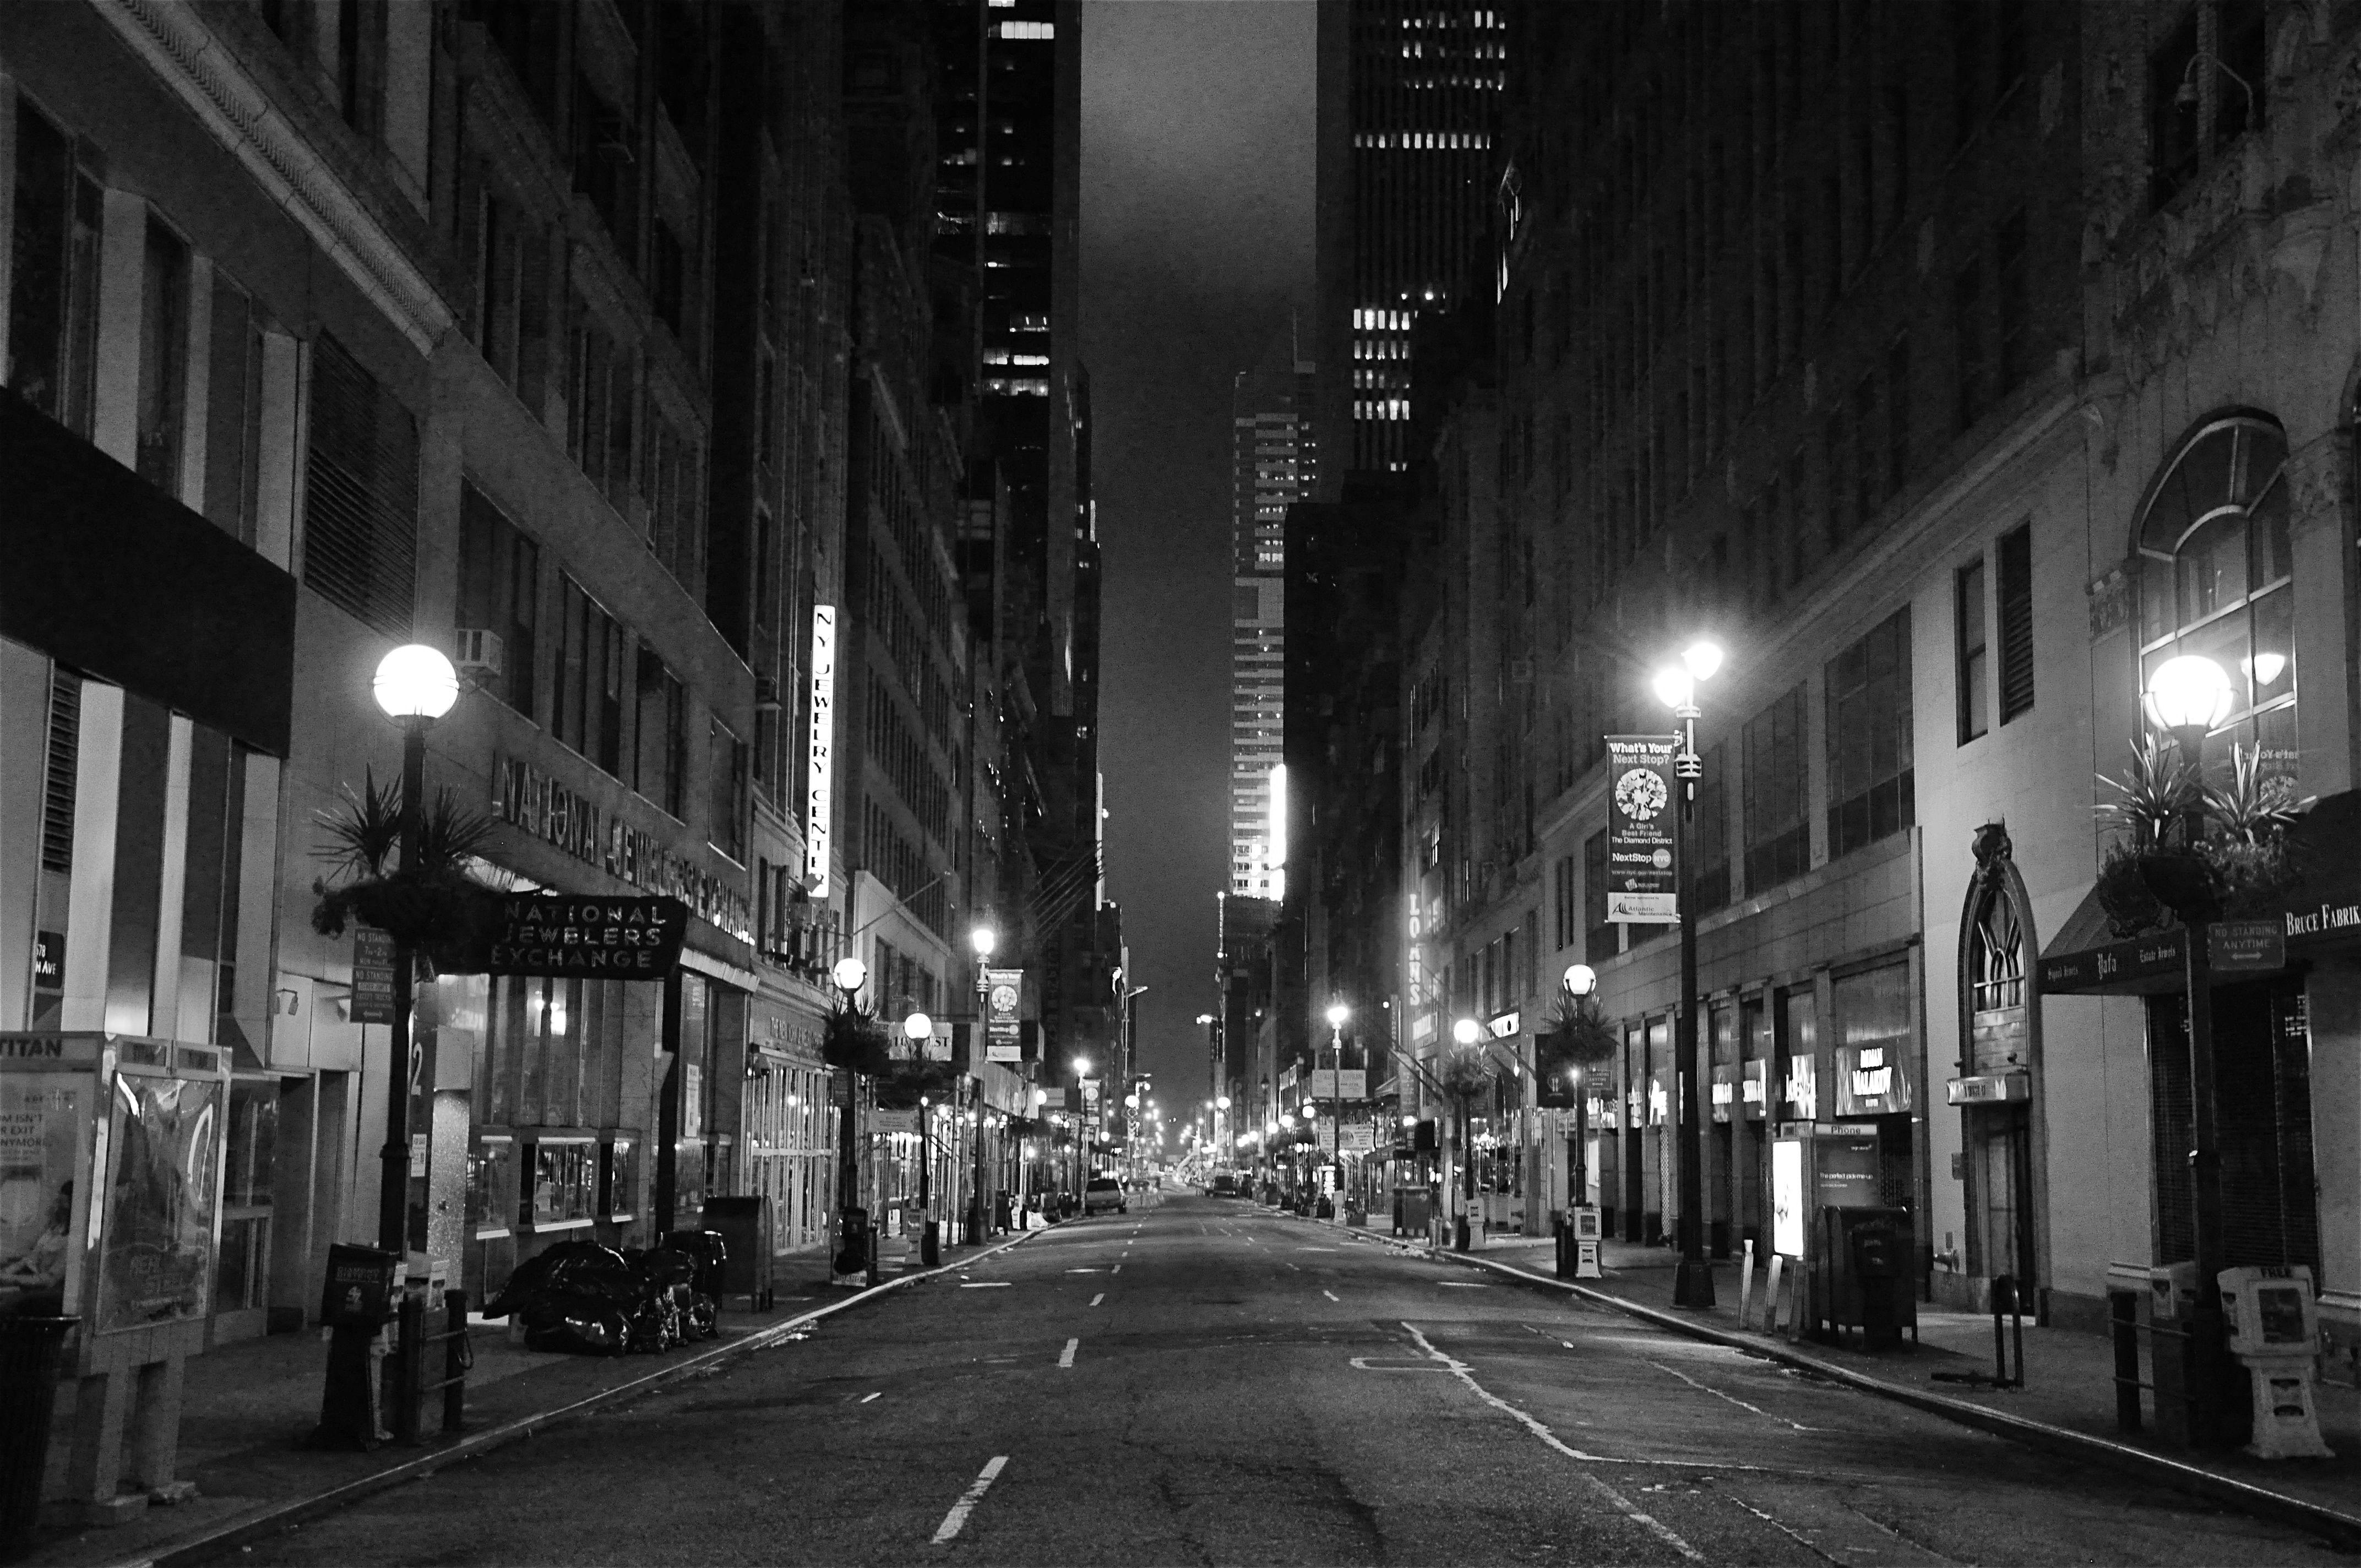 New York City Street Free Download Image City Streets Photography City Streets Street Photography Camera